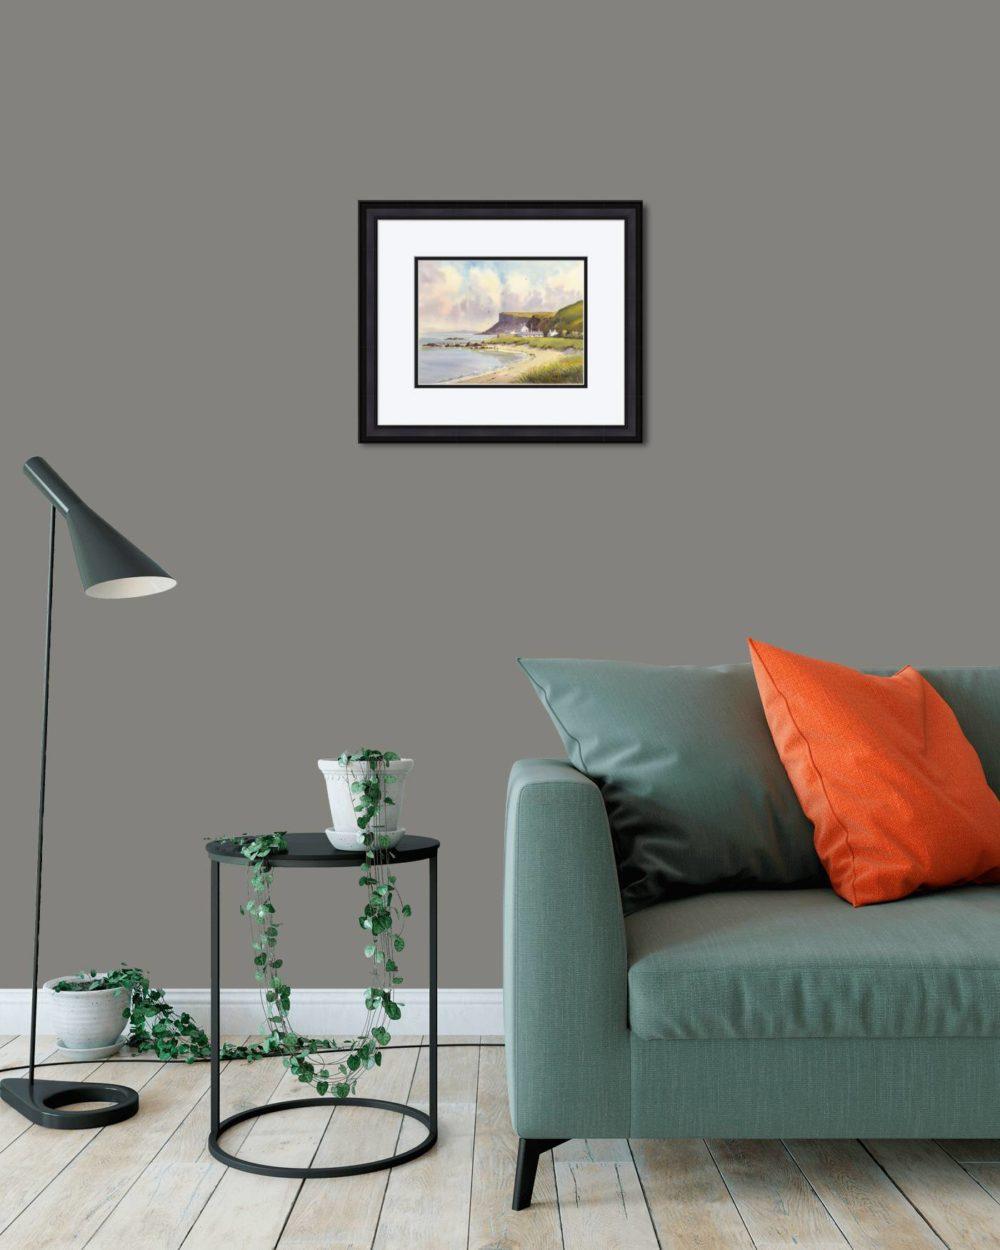 Fair Head Print (Small) in Black Frame in Room